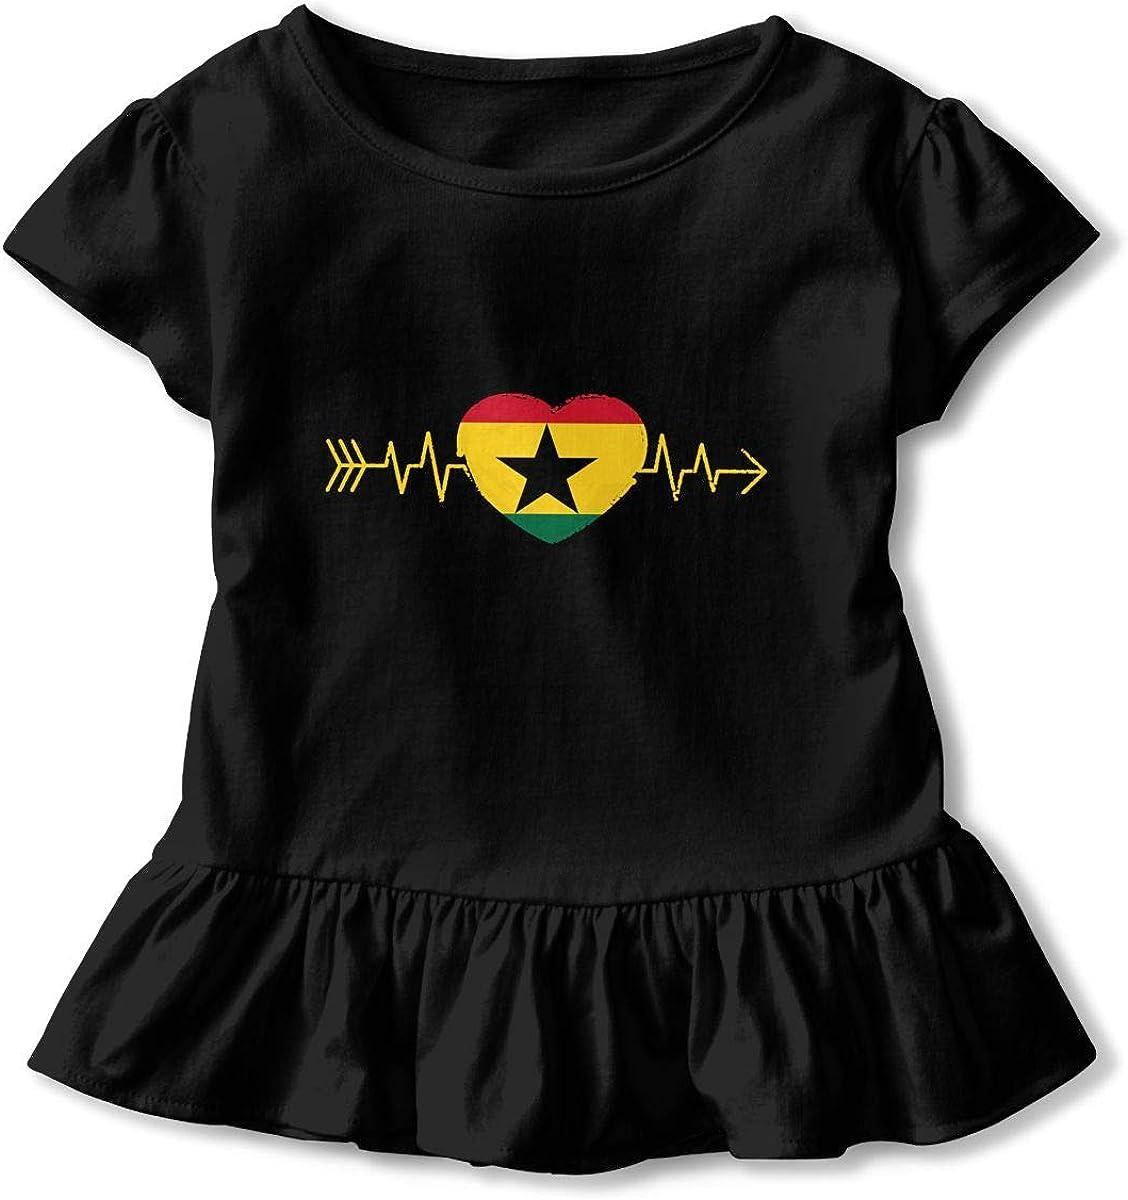 Ghana Country Flag Heartbeat Pride Toddler Girls T Shirt Kids Cotton Short Sleeve Ruffle Tee